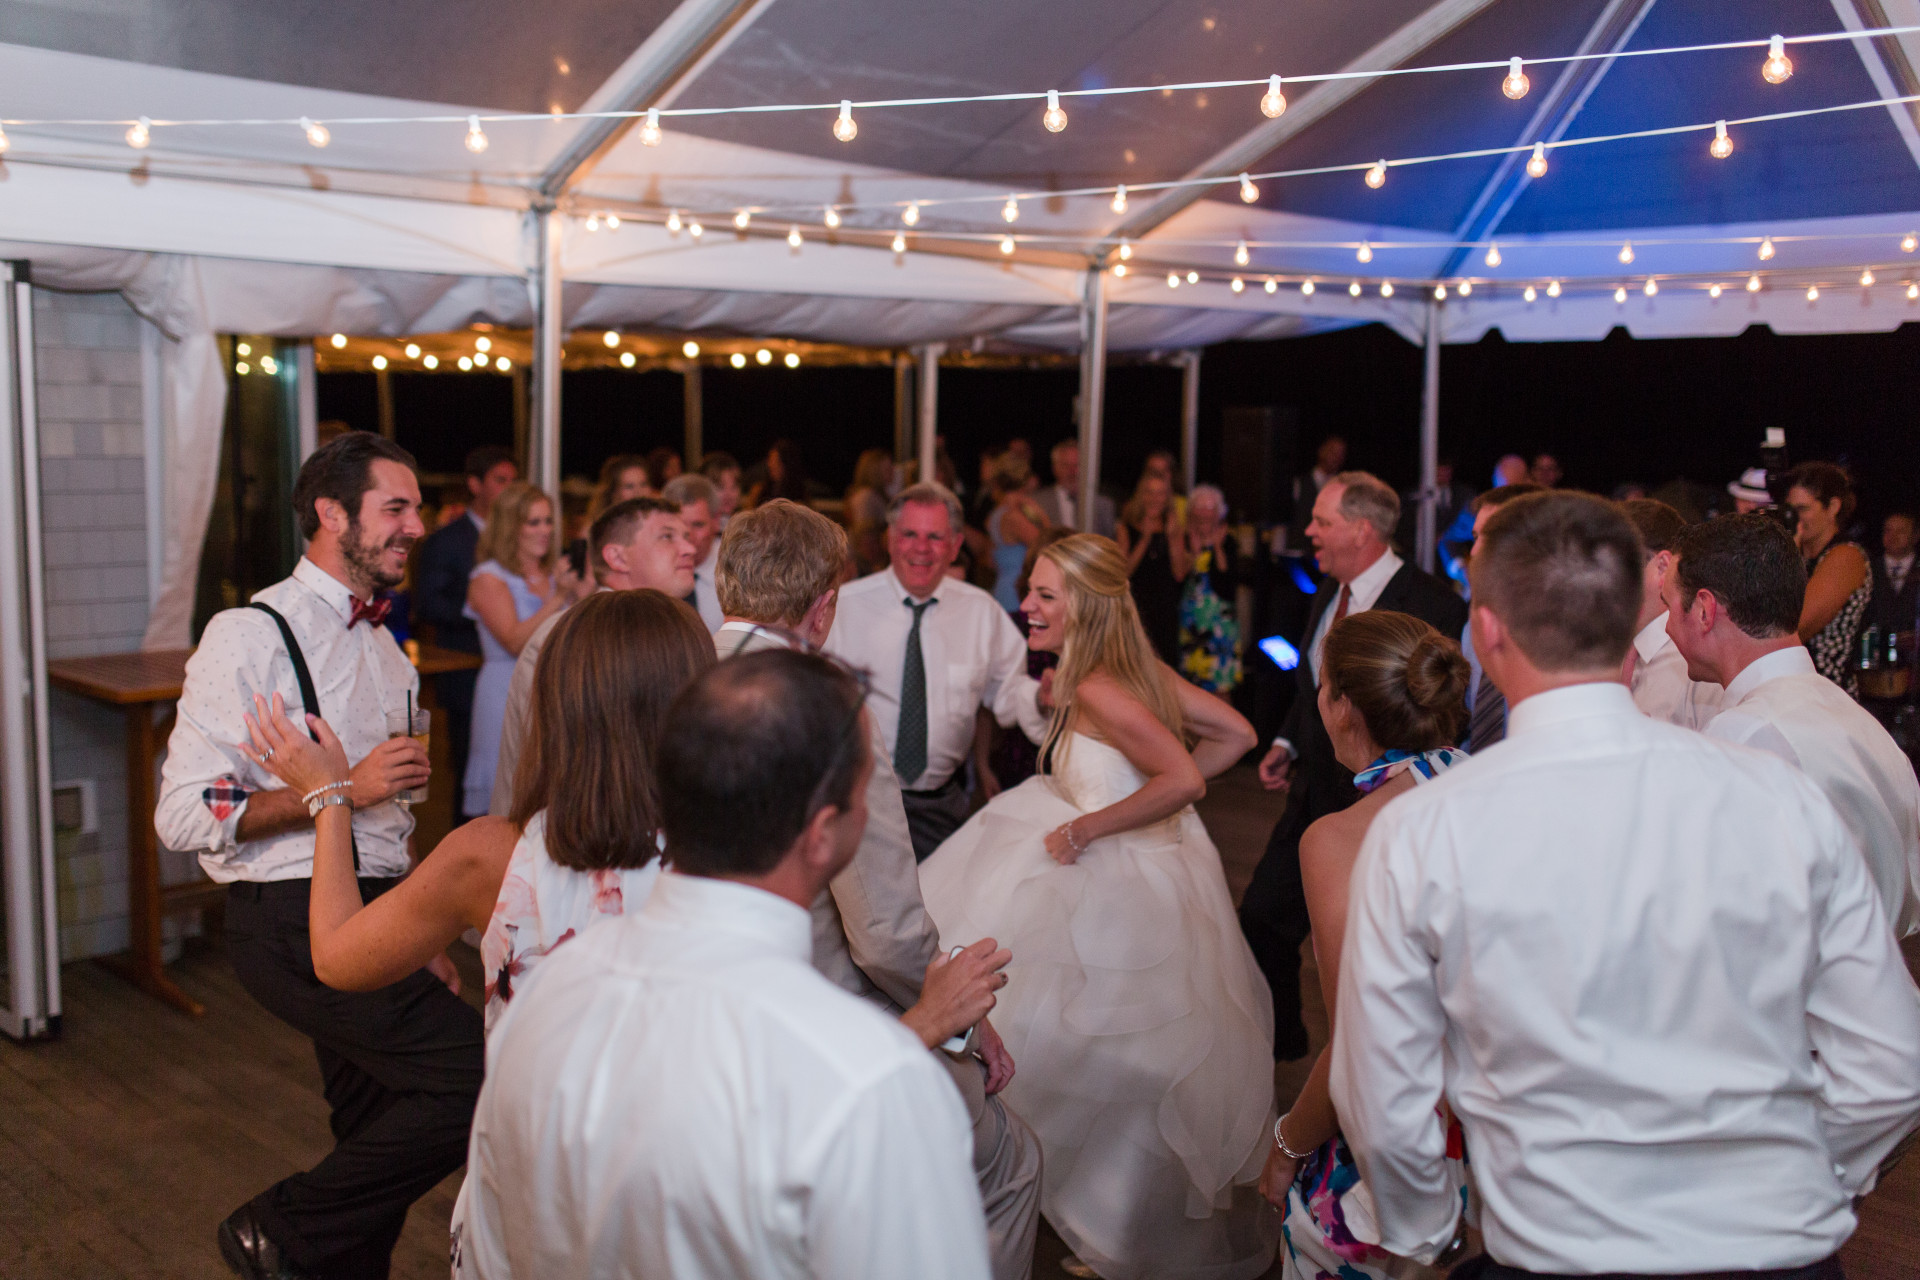 jt-cbi-wedding-cape-cod-groove-alliance-shoreshotz-0003